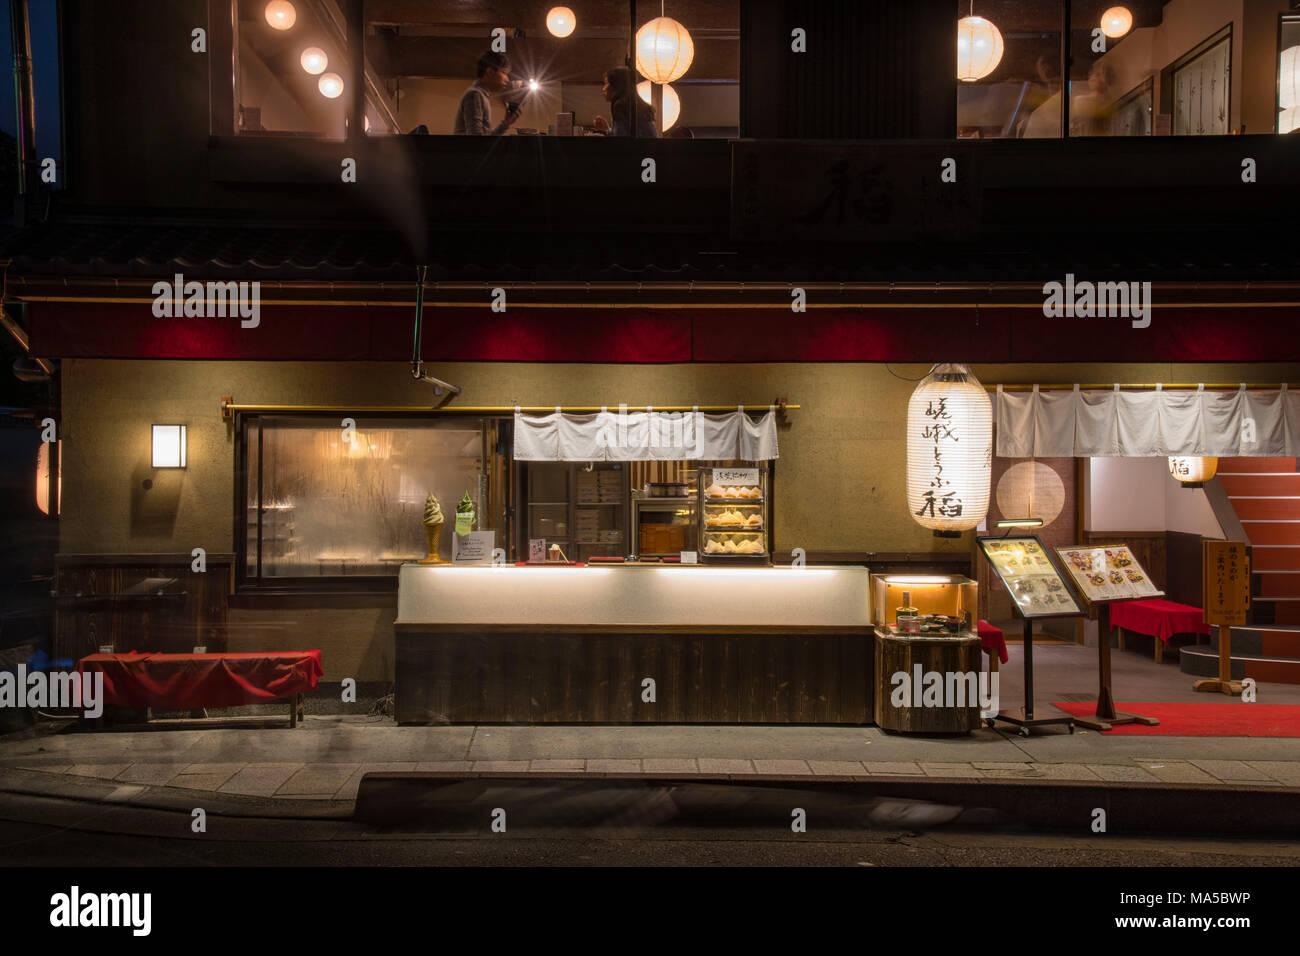 Asien, Japan, Nihon, Nippon, Kyoto, japanisches Restaurant Stockbild